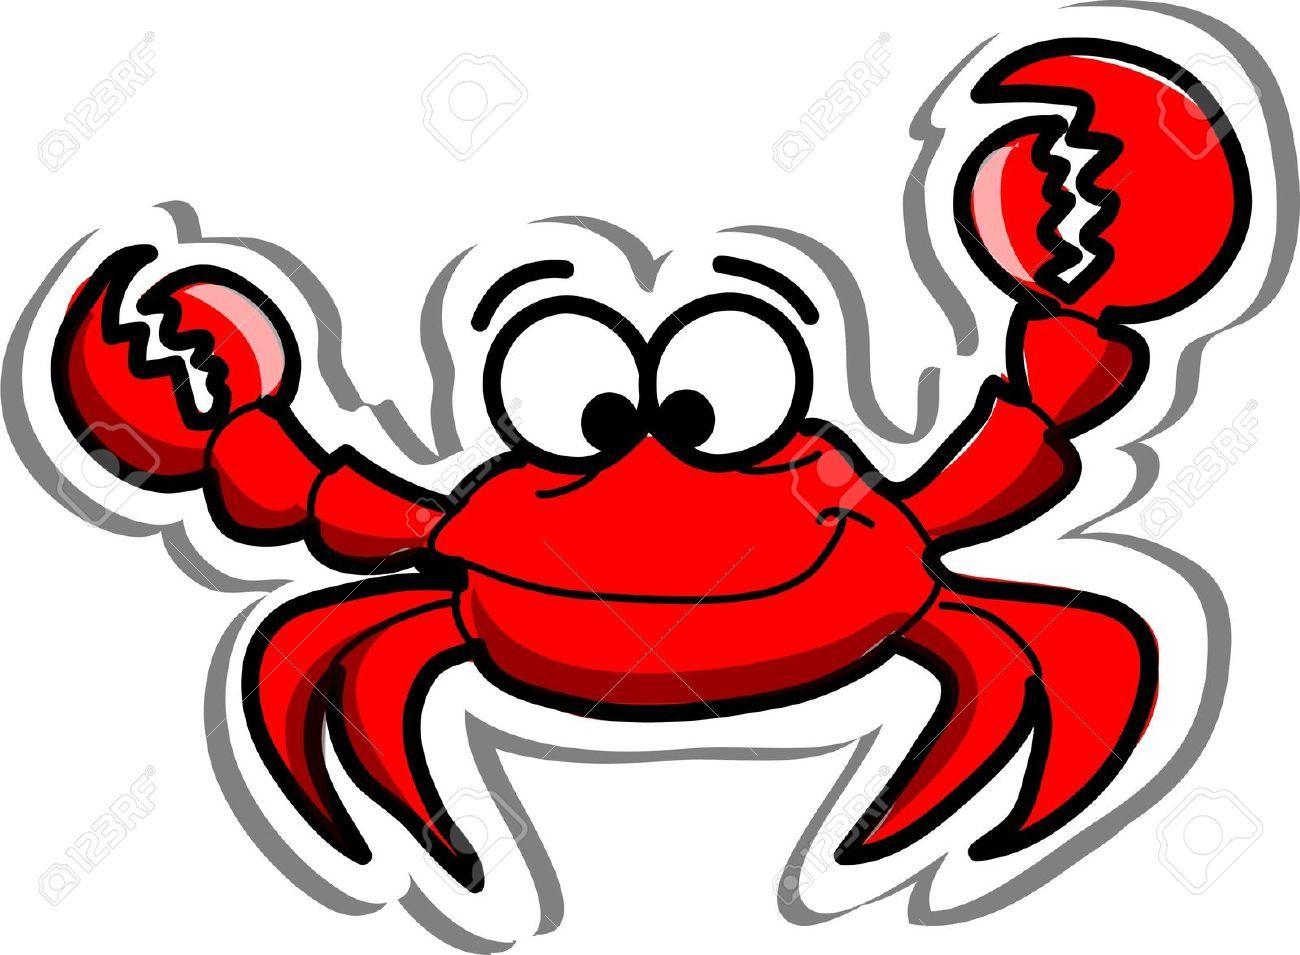 crab clipart illustration